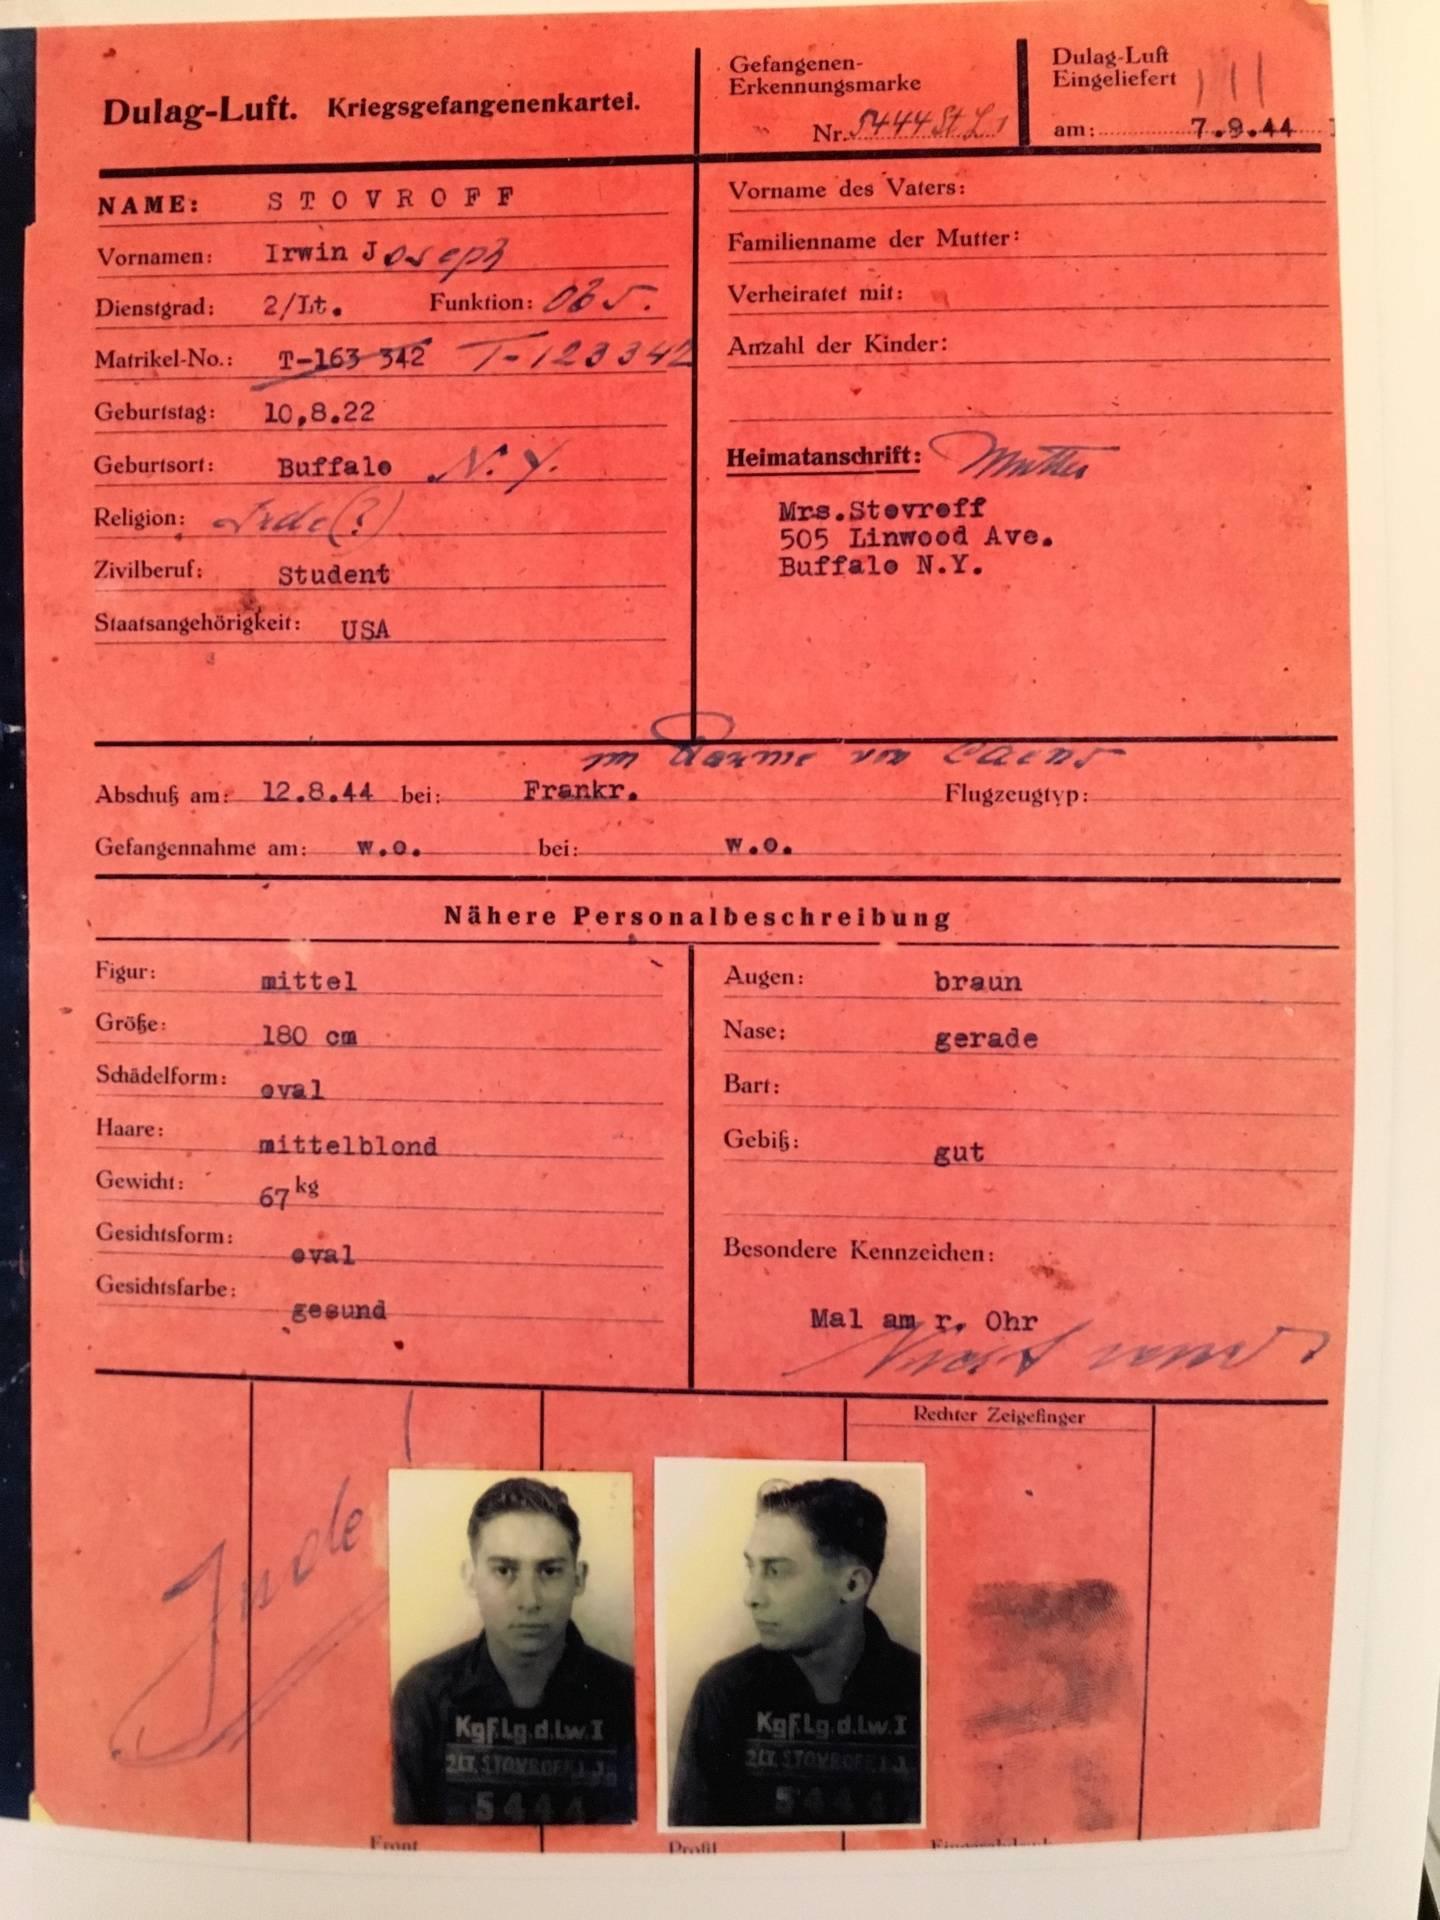 Irwin Stovroff's interrogation record